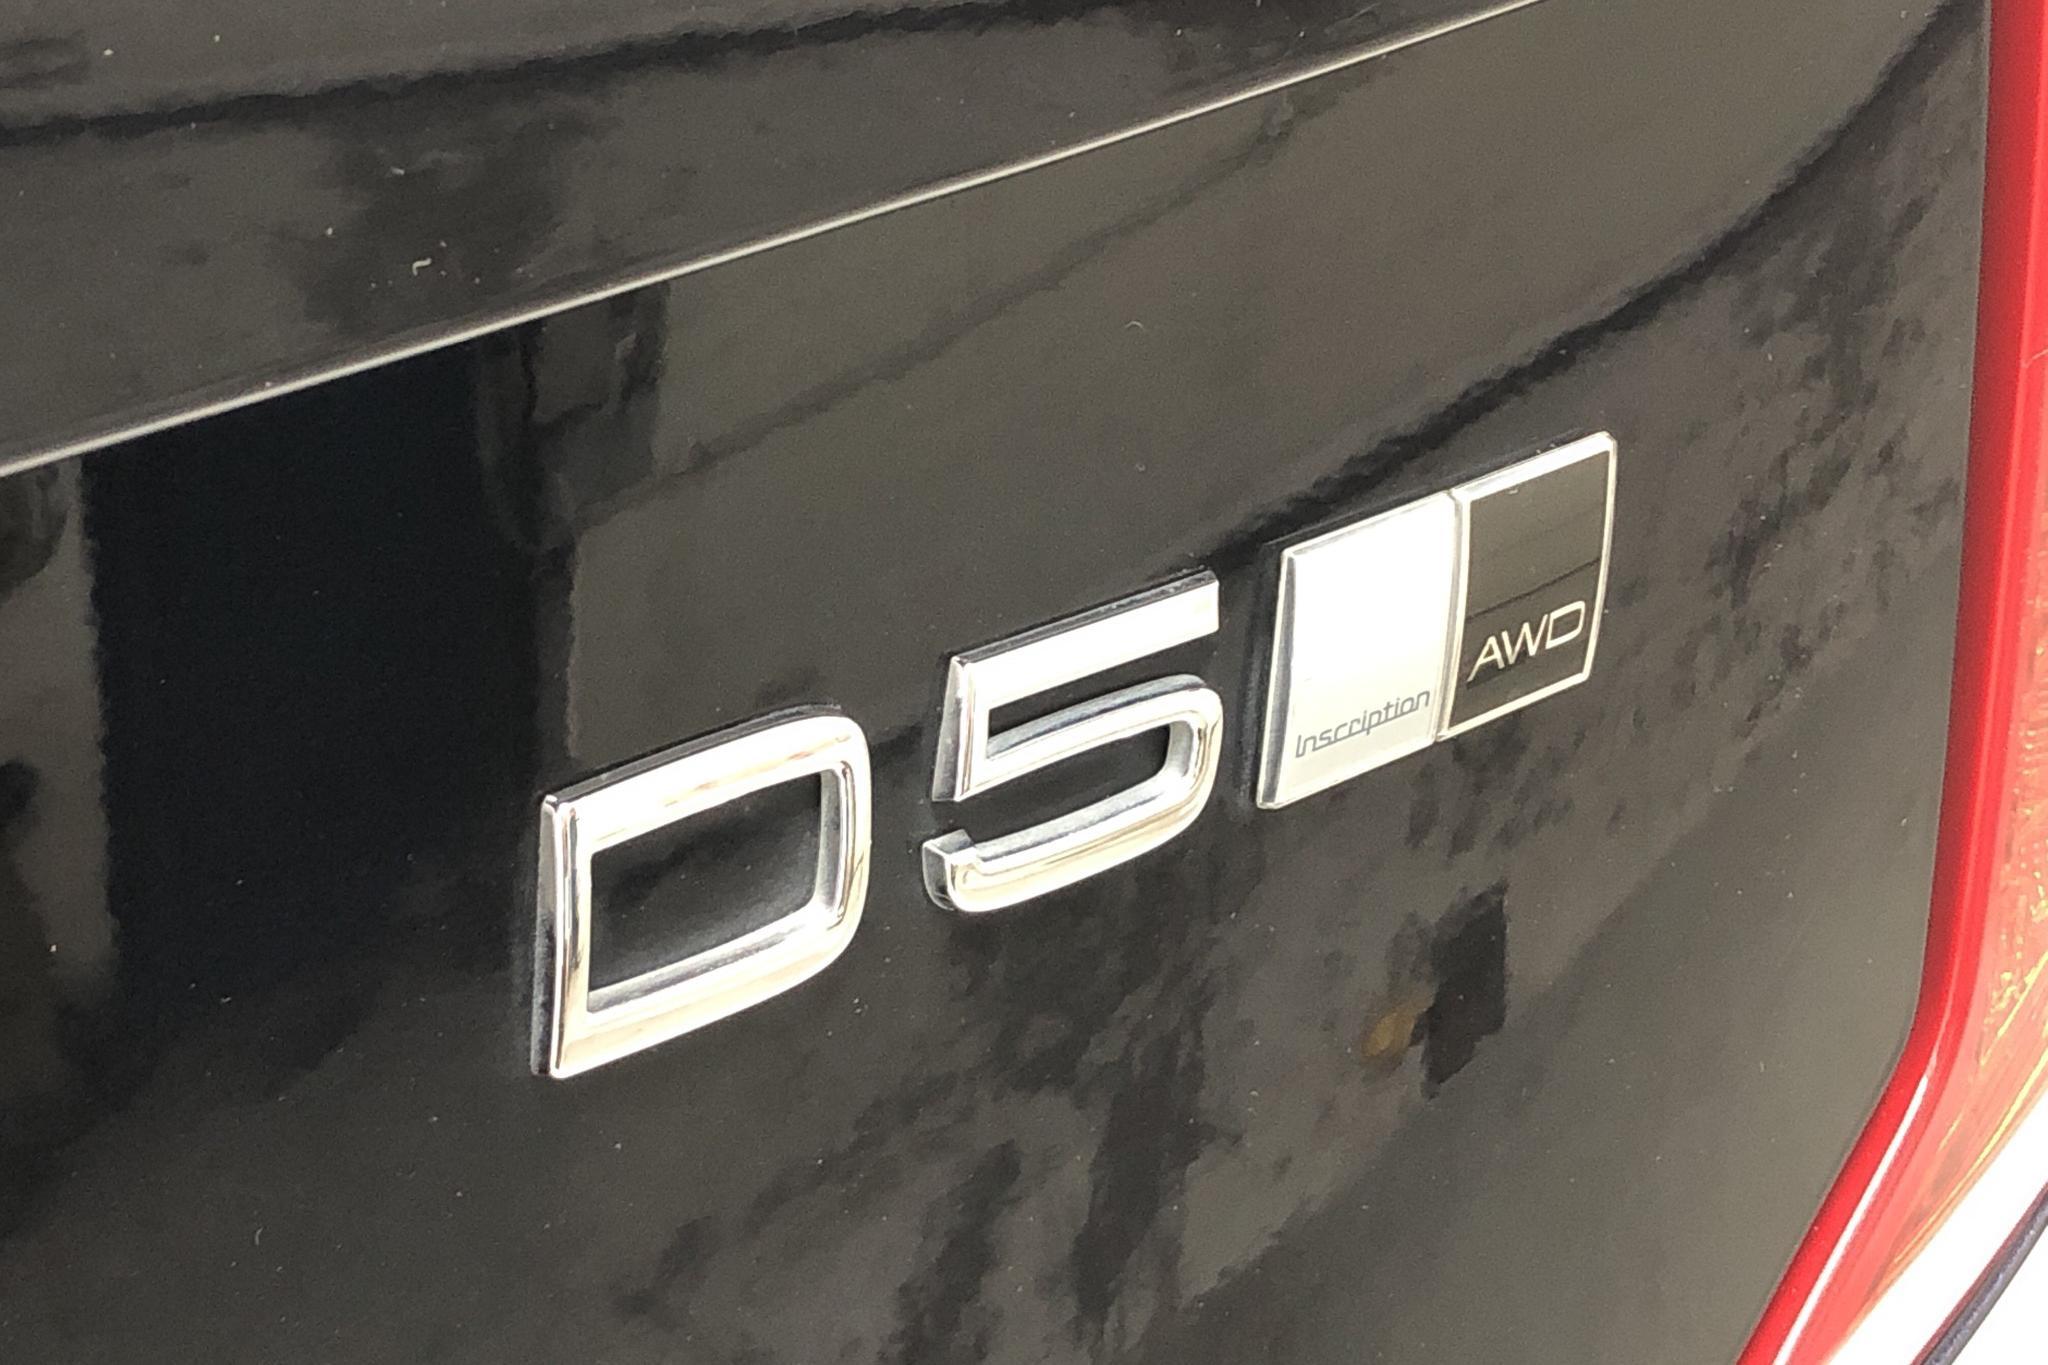 Volvo XC90 D5 AWD (235hk) - 48 940 km - Automatic - Dark Blue - 2017